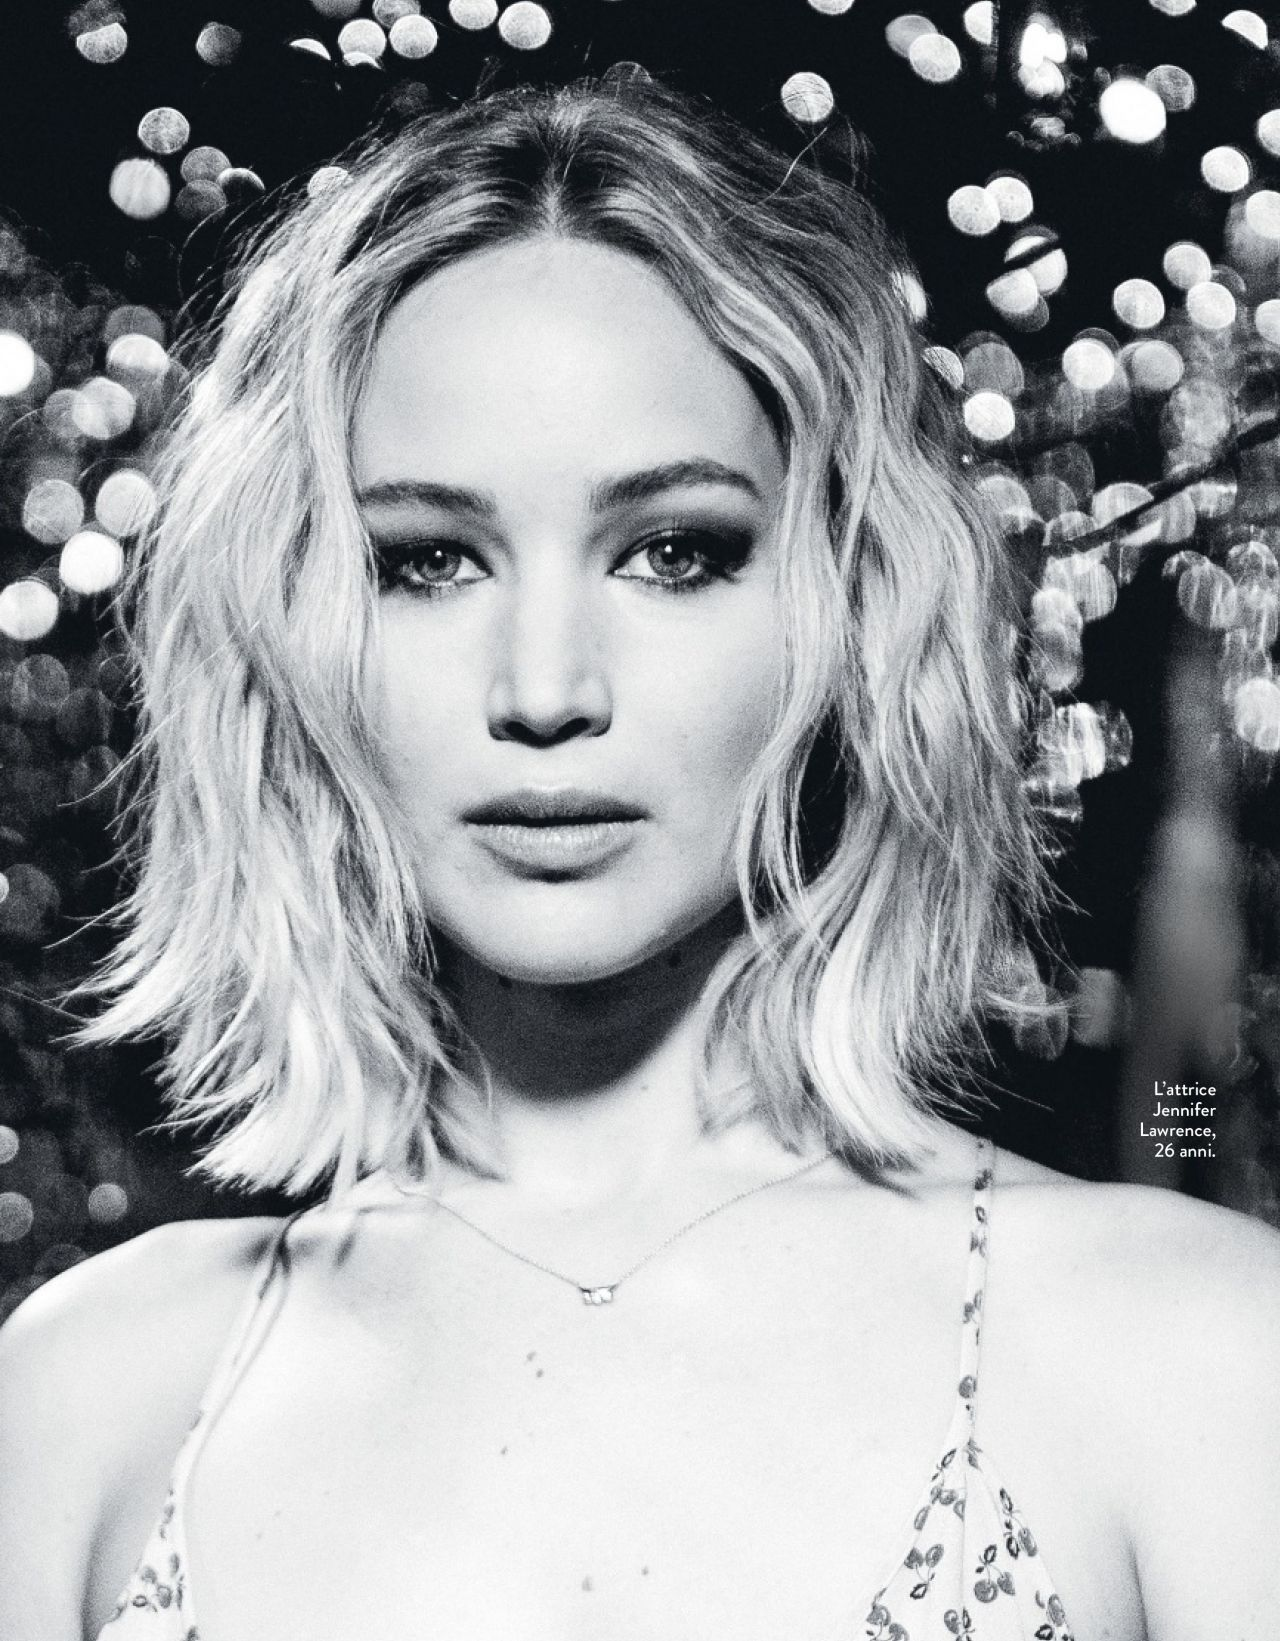 Jennifer Lawrence B&W Photo